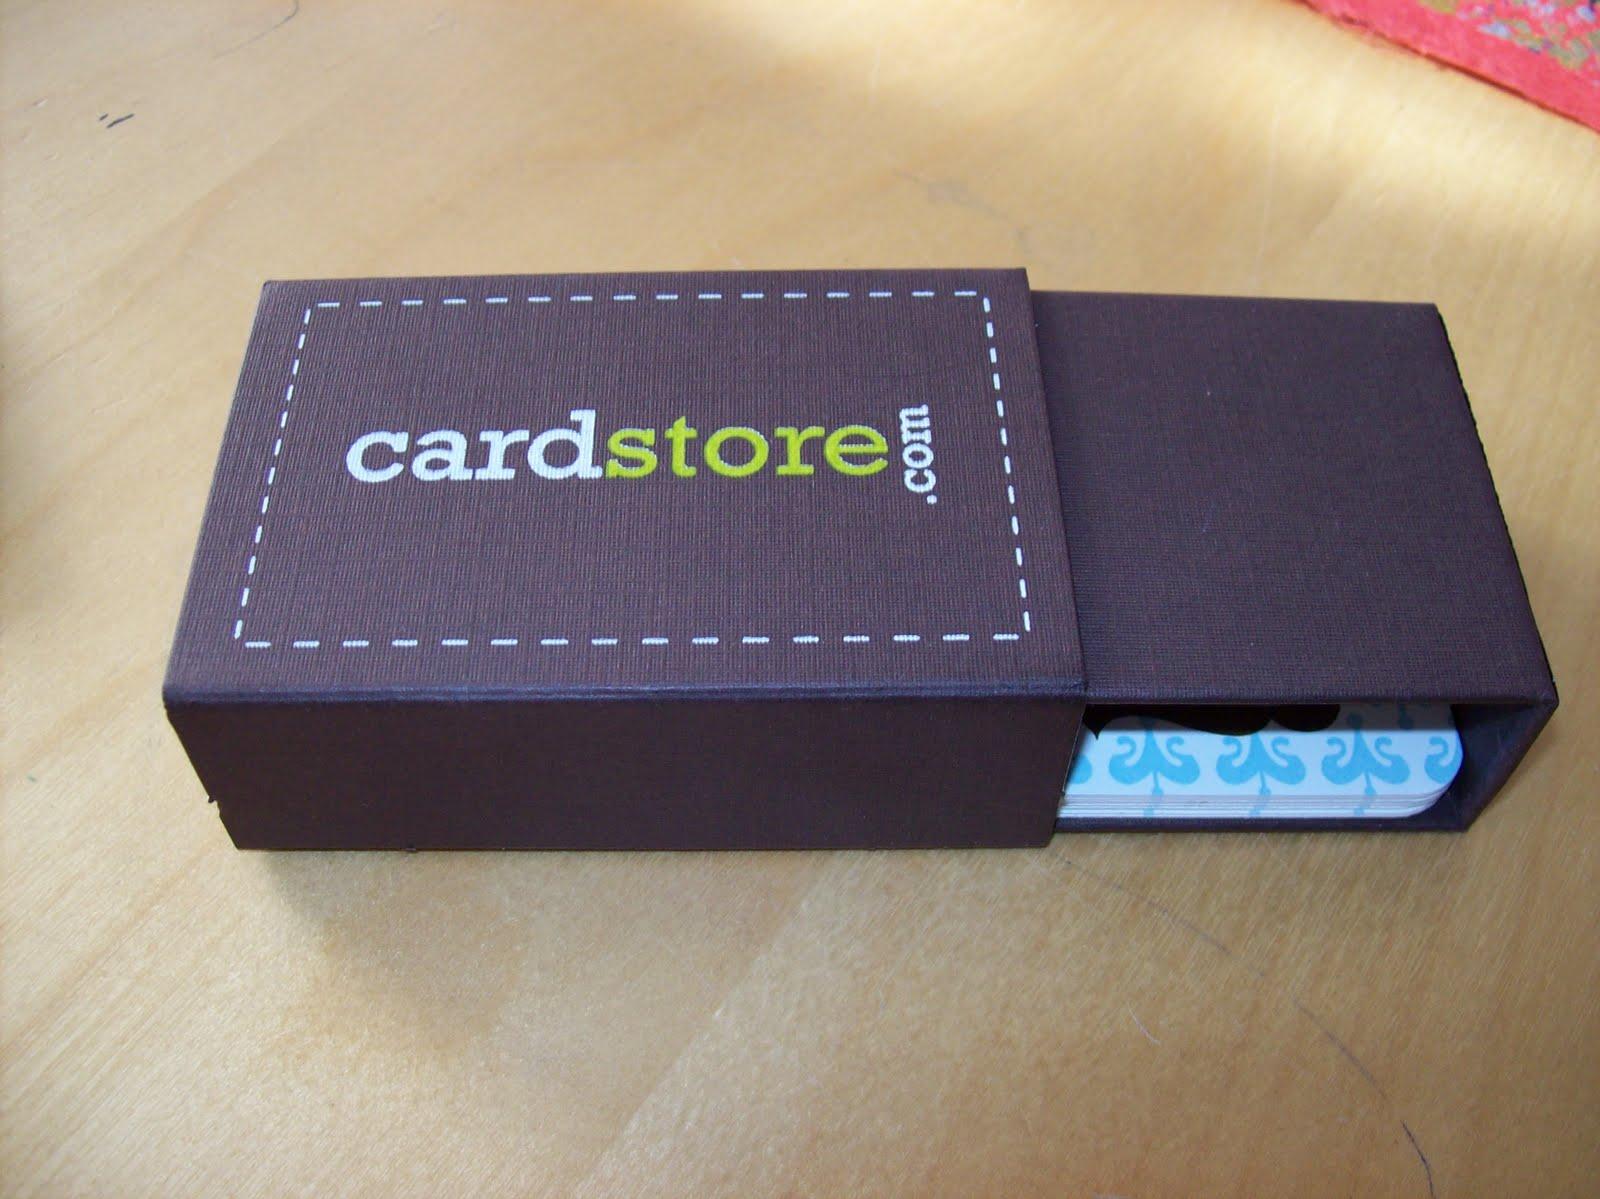 Kate harper blog calling cards vs business cards calling cards vs business cards magicingreecefo Gallery